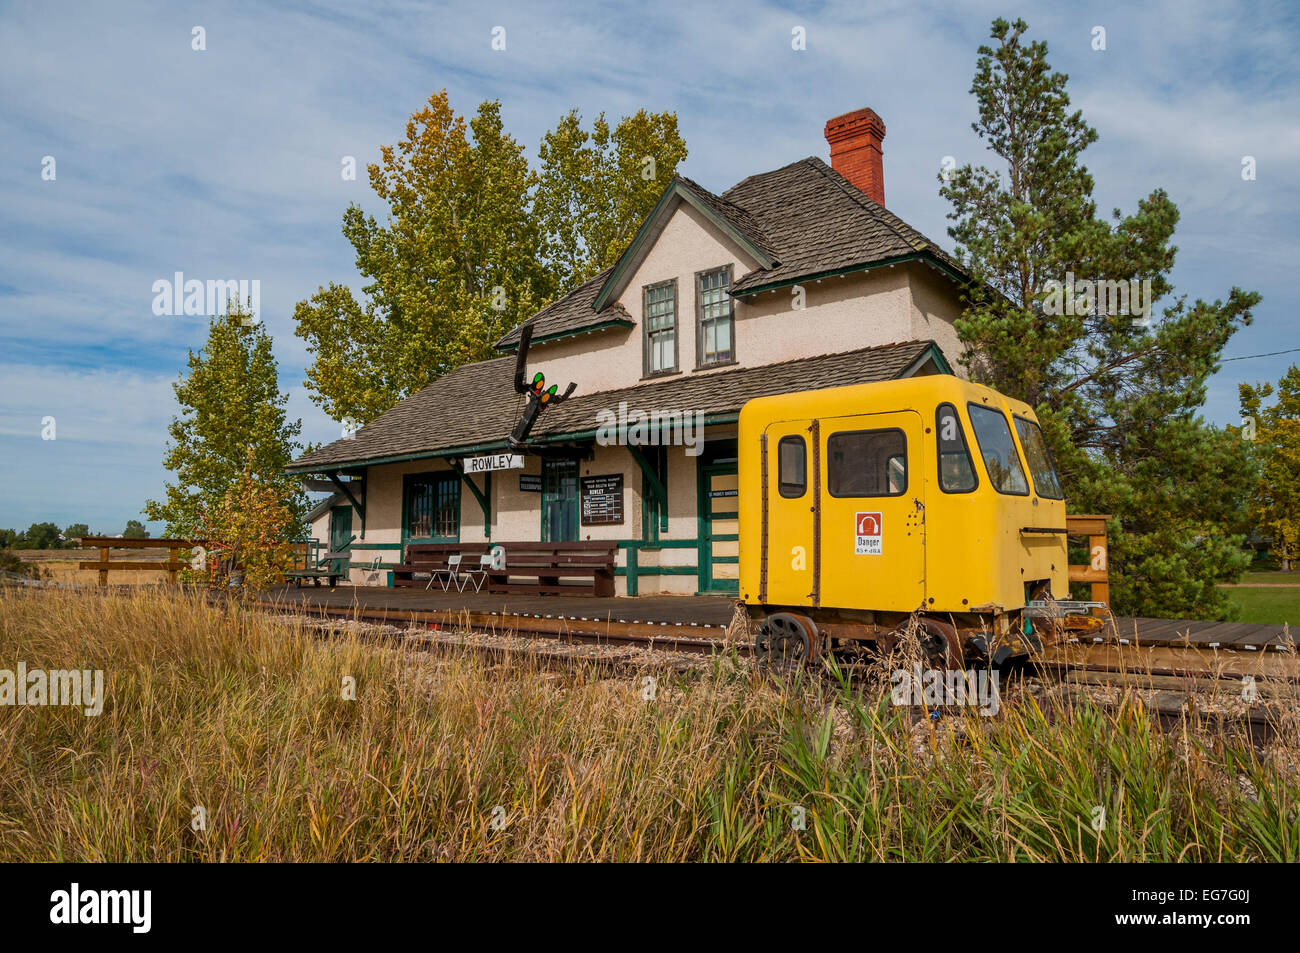 Heritage Train Station, Rowley, Alberta, Canada - Stock Image